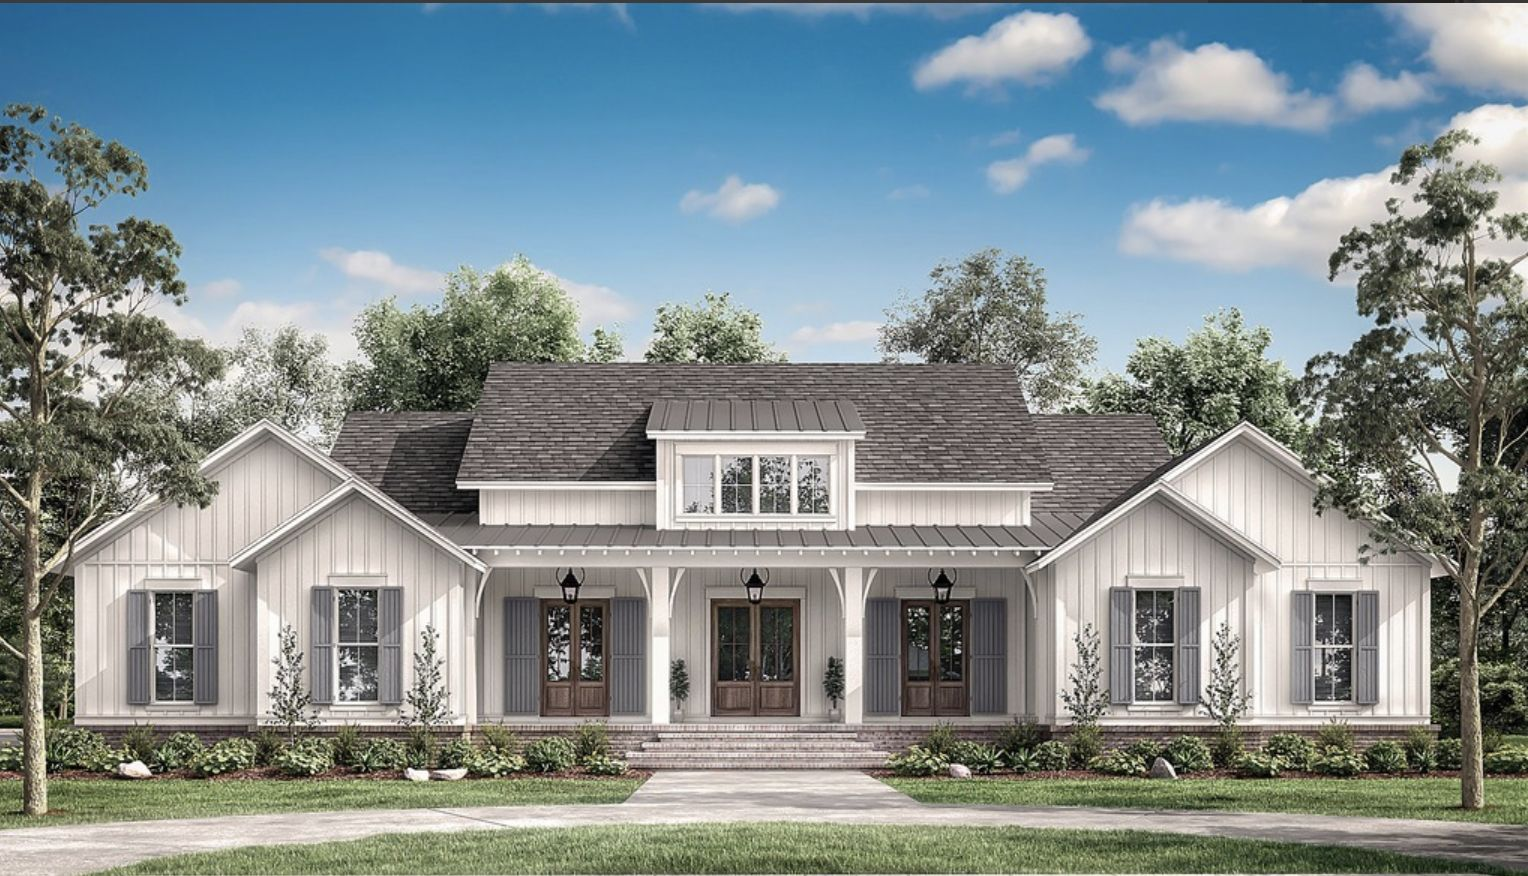 15++ Modern farmhouse elevations type